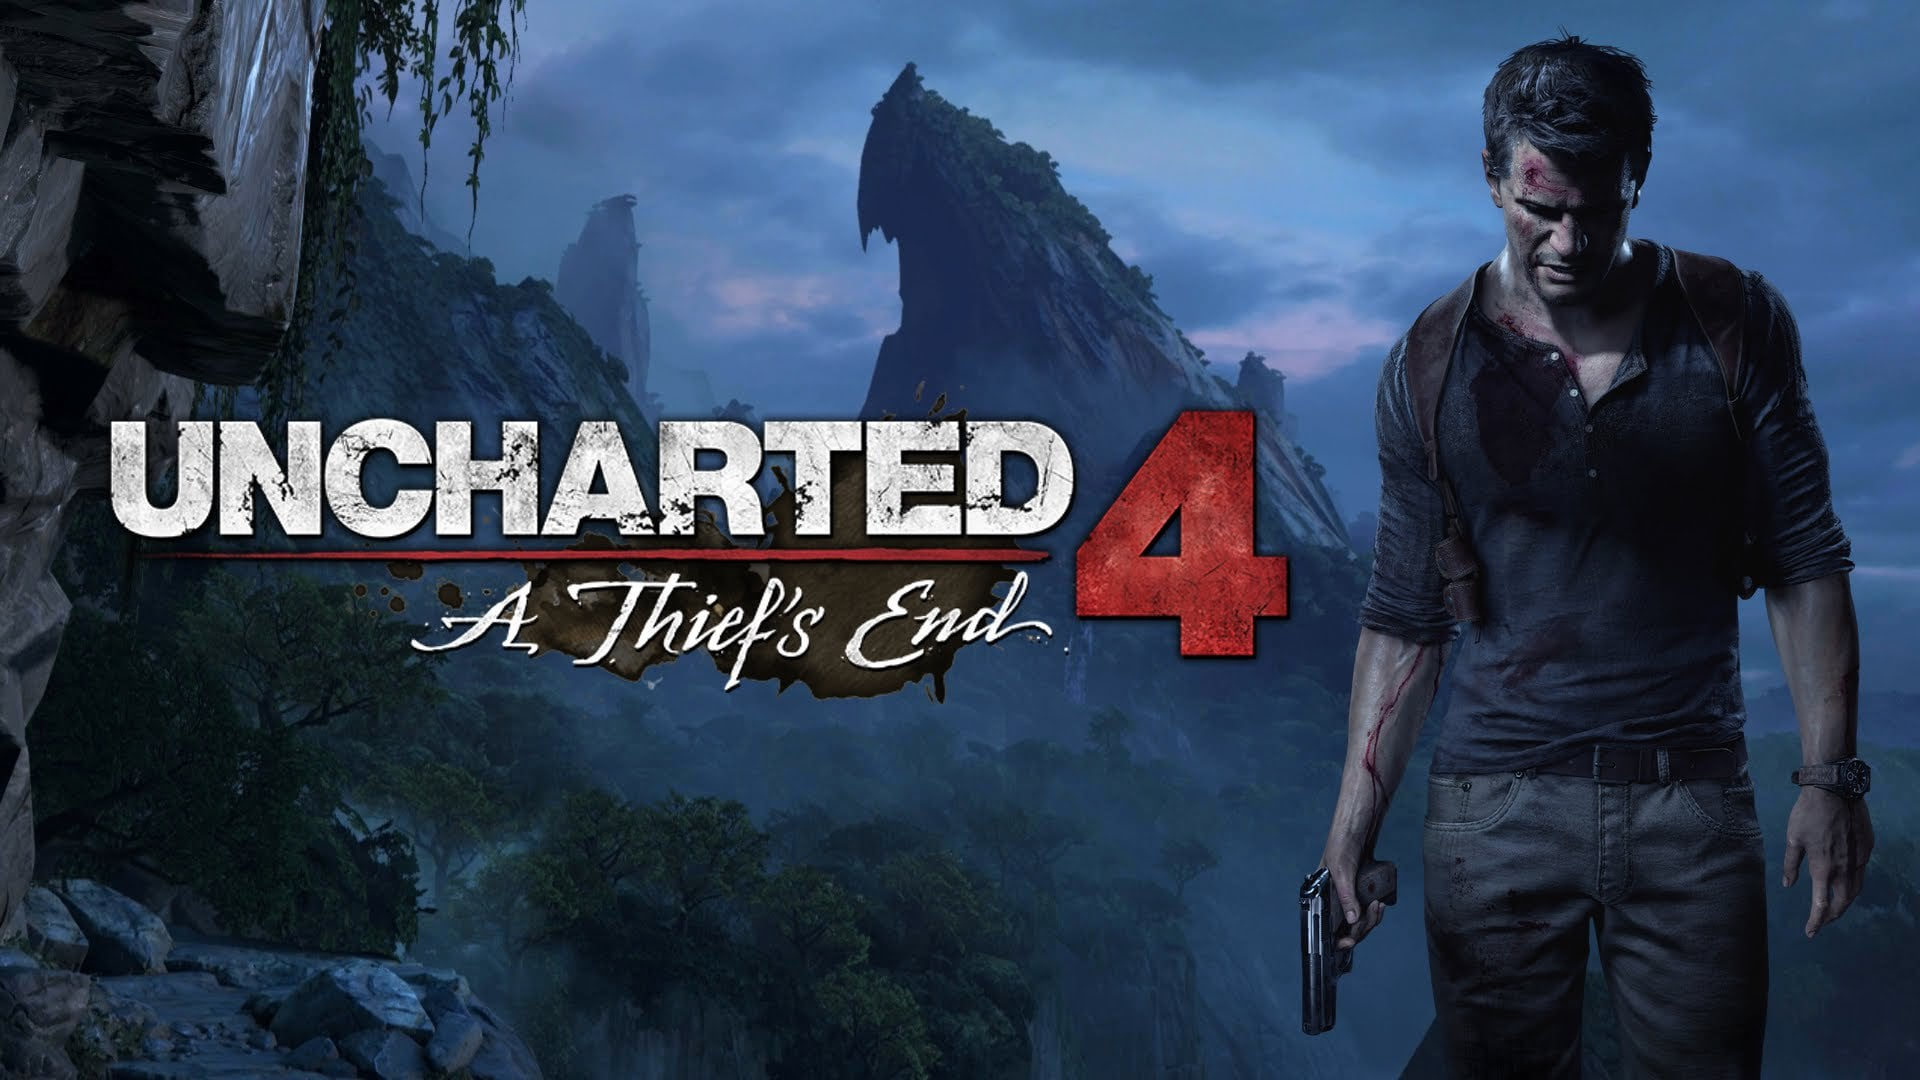 En Gerçekçi Oyunlar En Gerçekçi Oyunlar En Gerçekçi Oyunlar uncharted 4